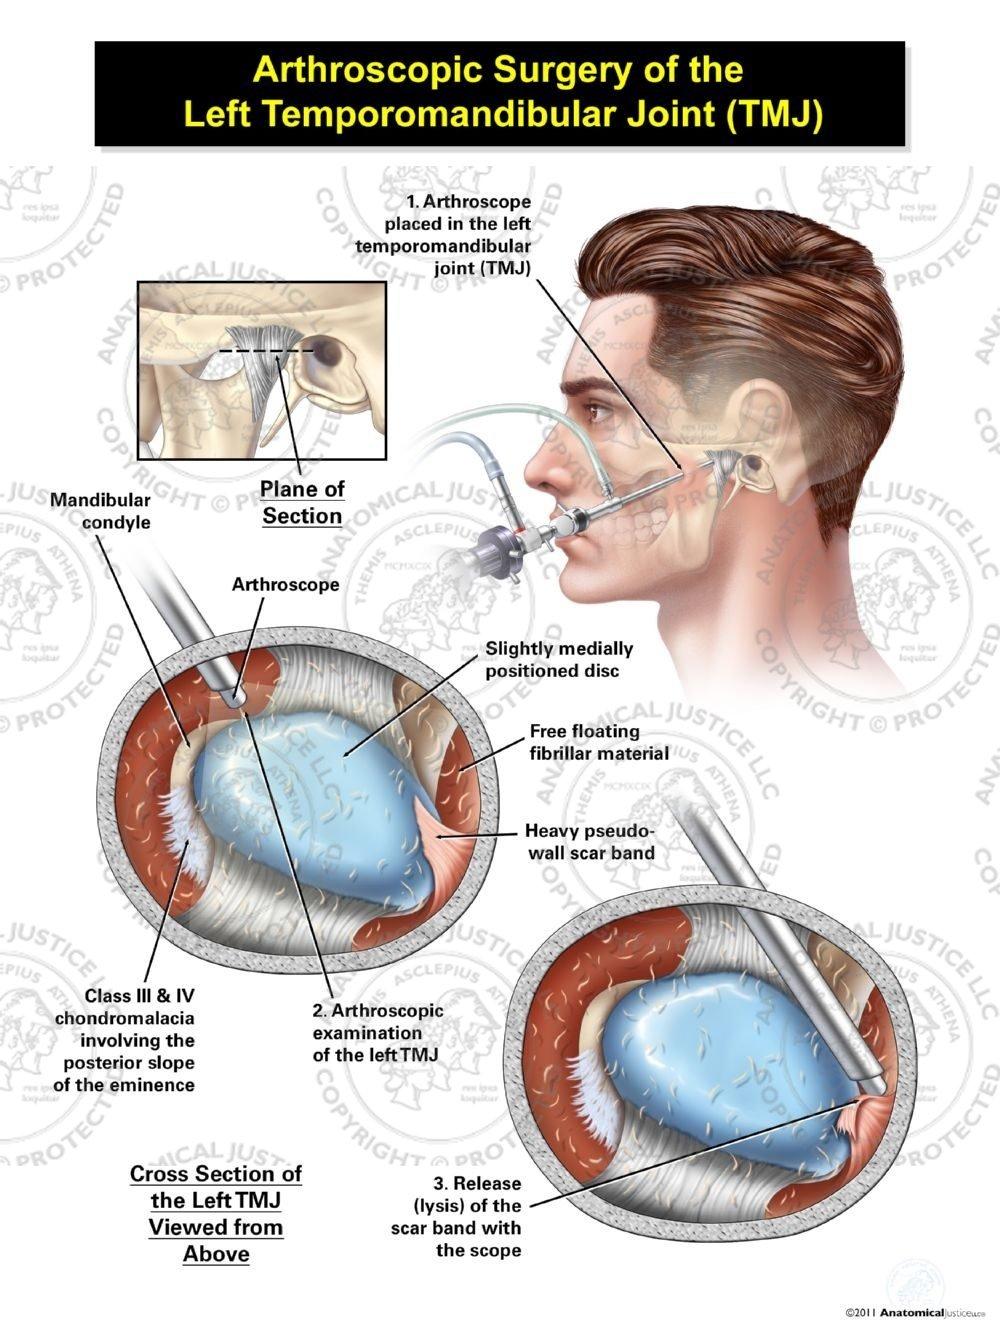 Male Arthroscopic Surgery Of The Left Temporomandibular Joint Tmj